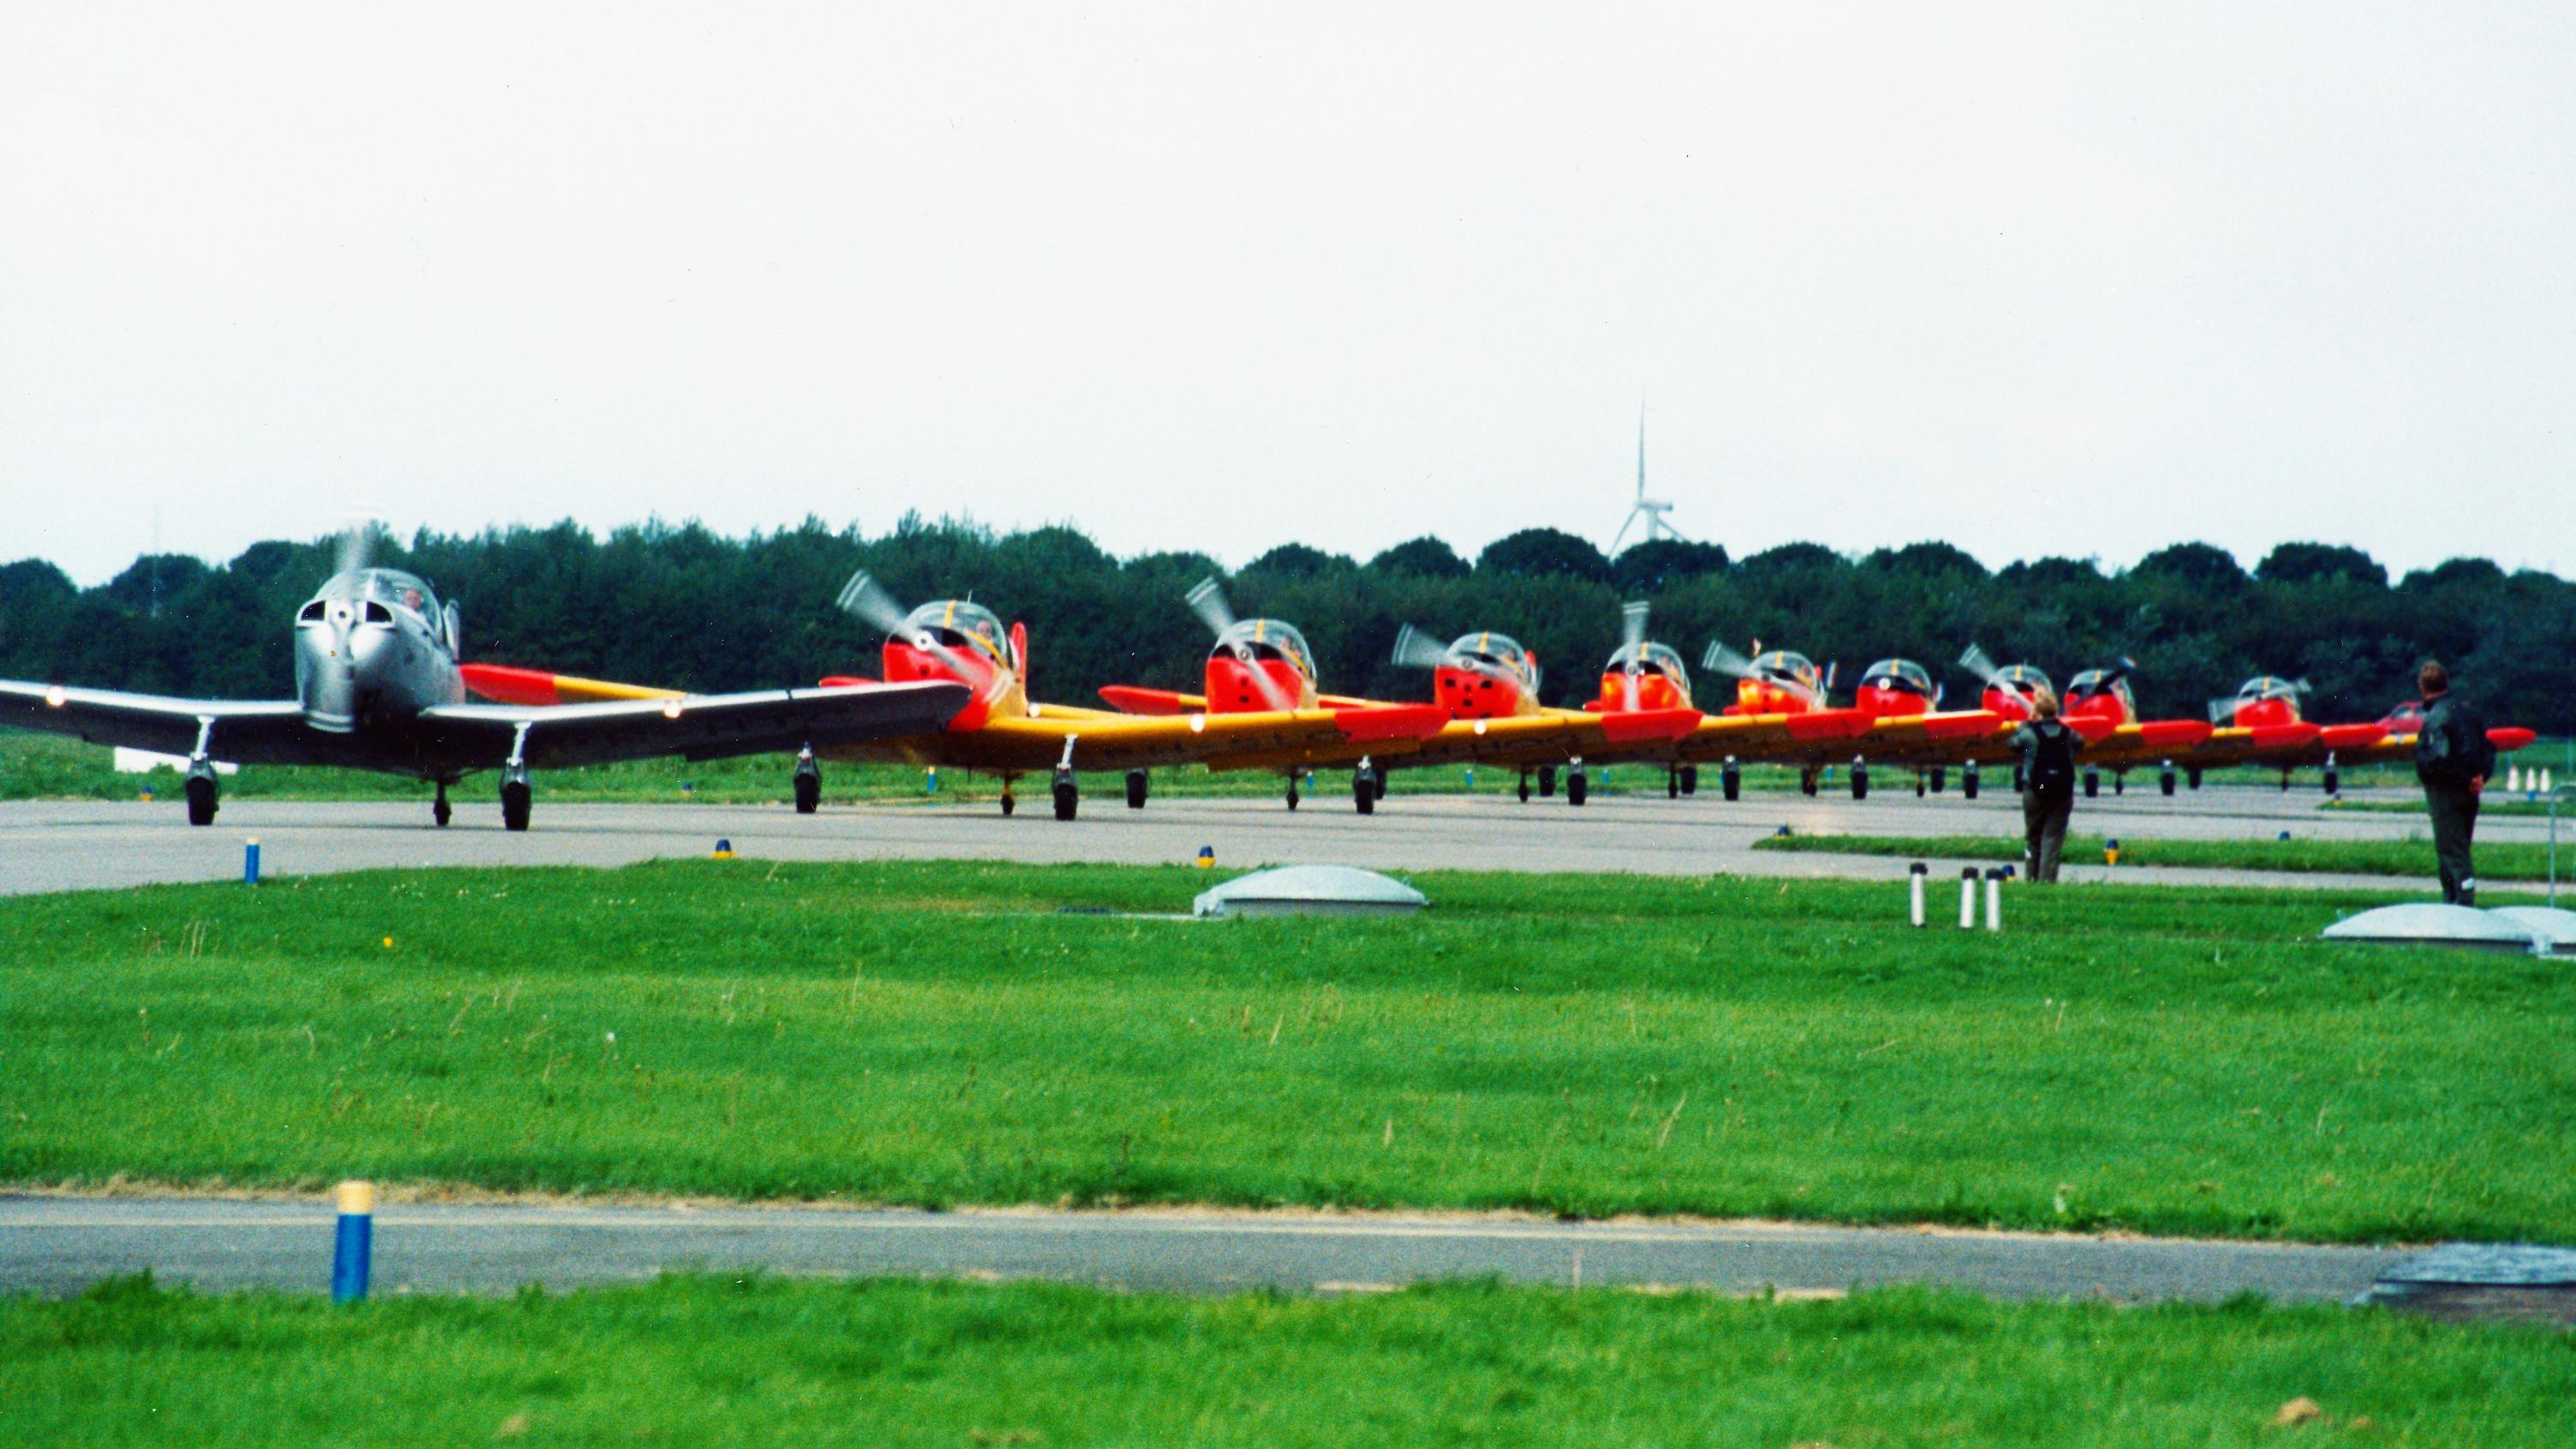 Naam: Fokker S.11 10x 1991 Lelystad.jpg Bekeken: 215 Grootte: 508,3 KB